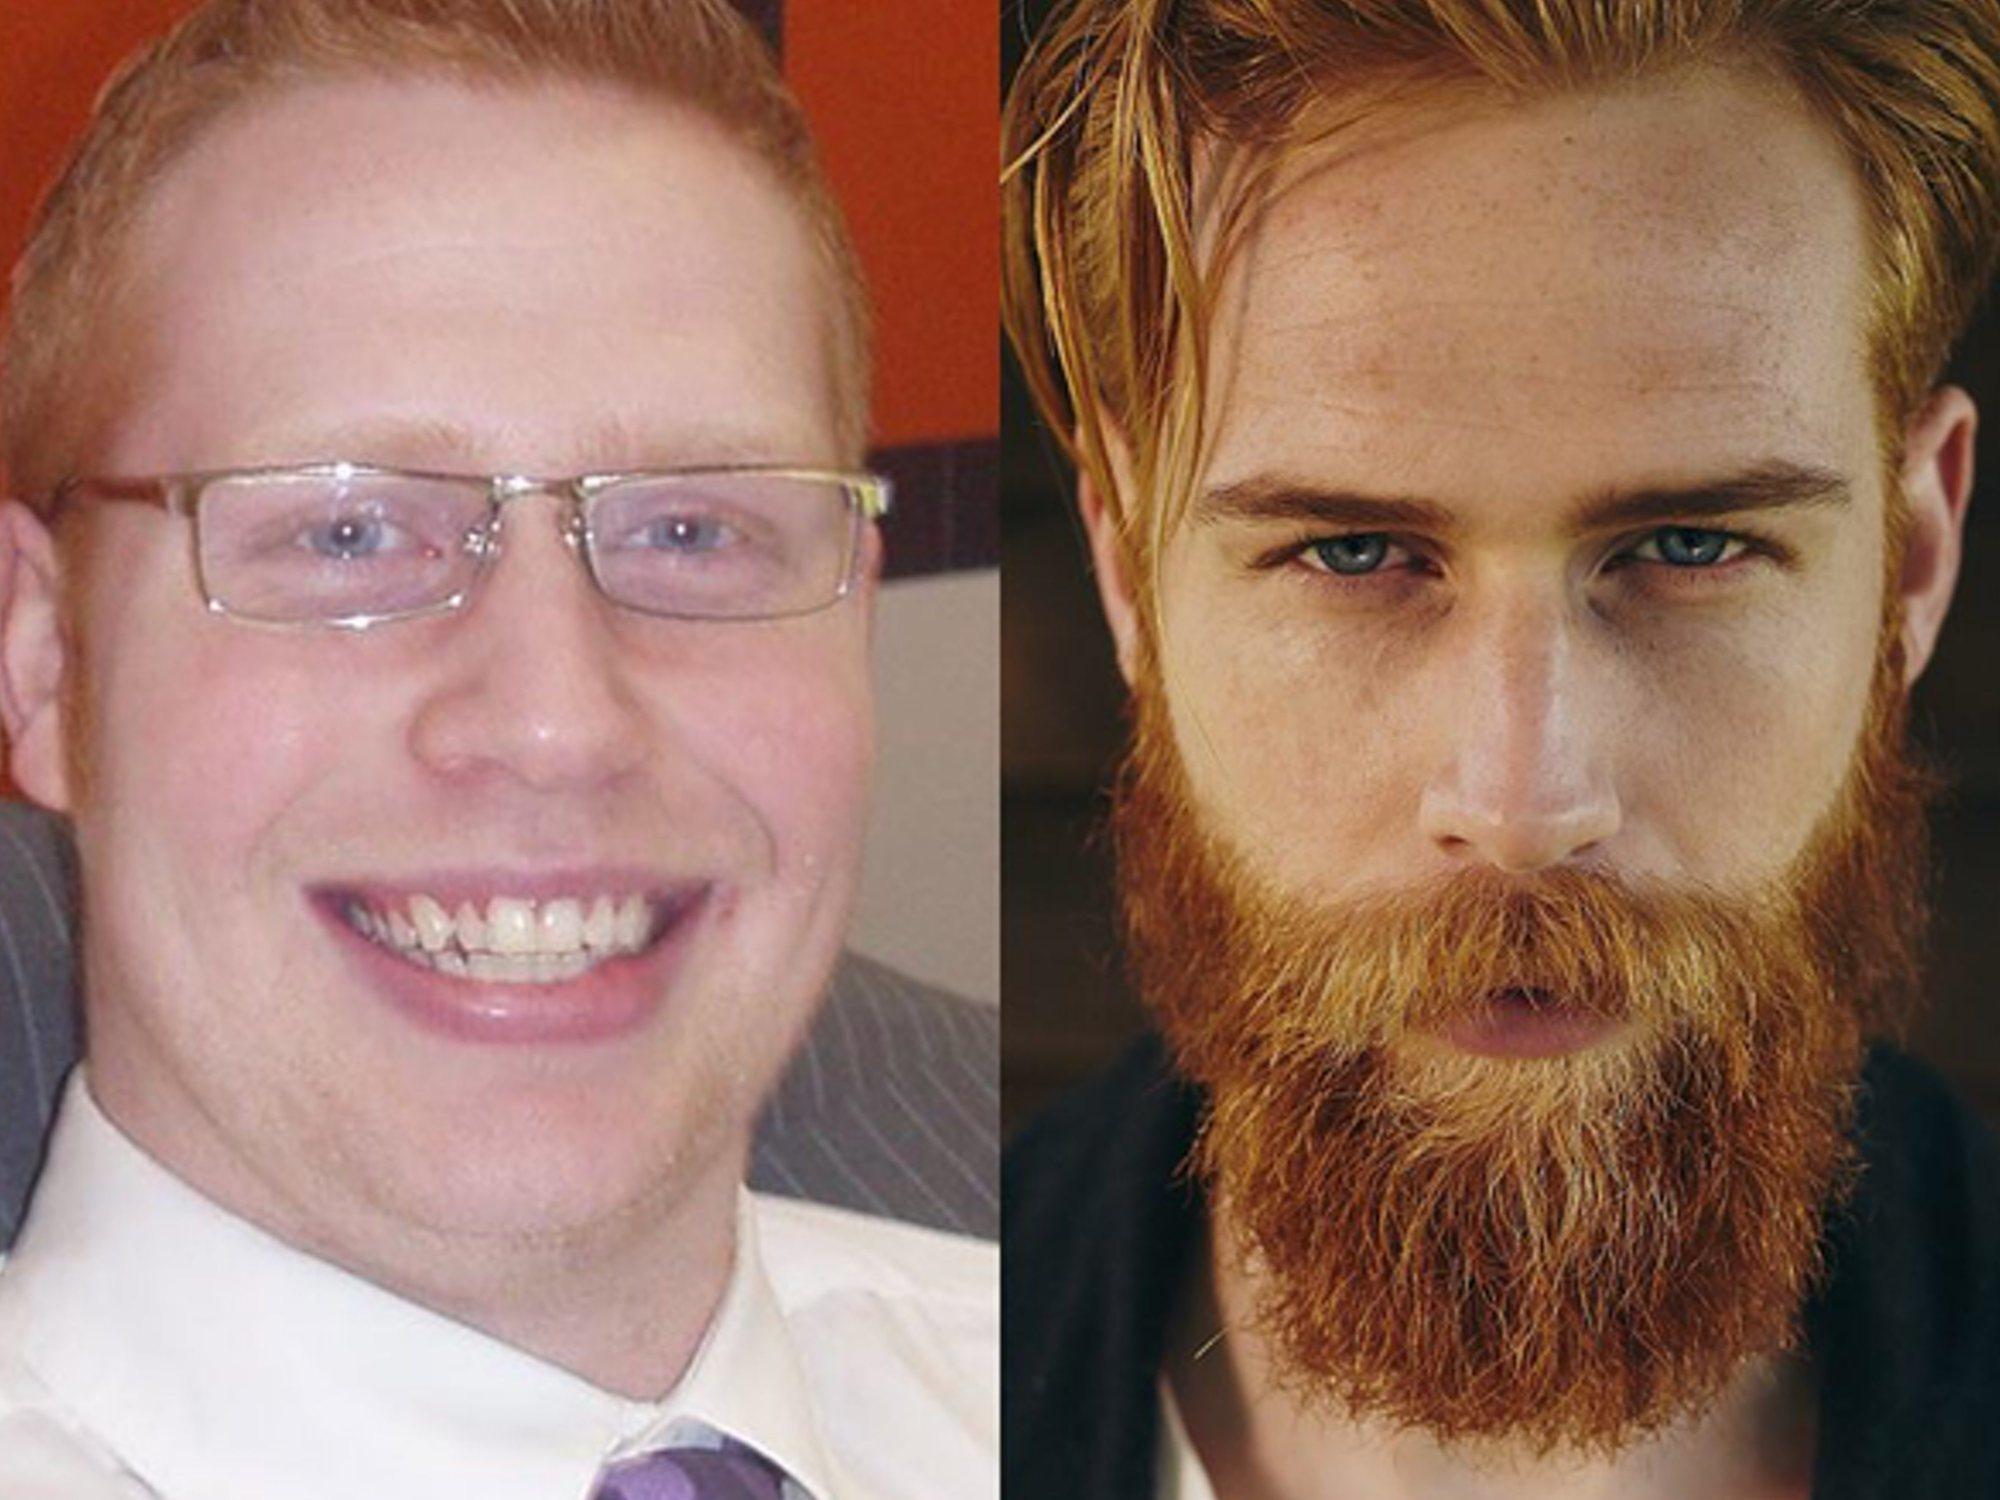 Cambio radical: Pierde 50 kilos, se deja barba y se convierte en modelo internacional